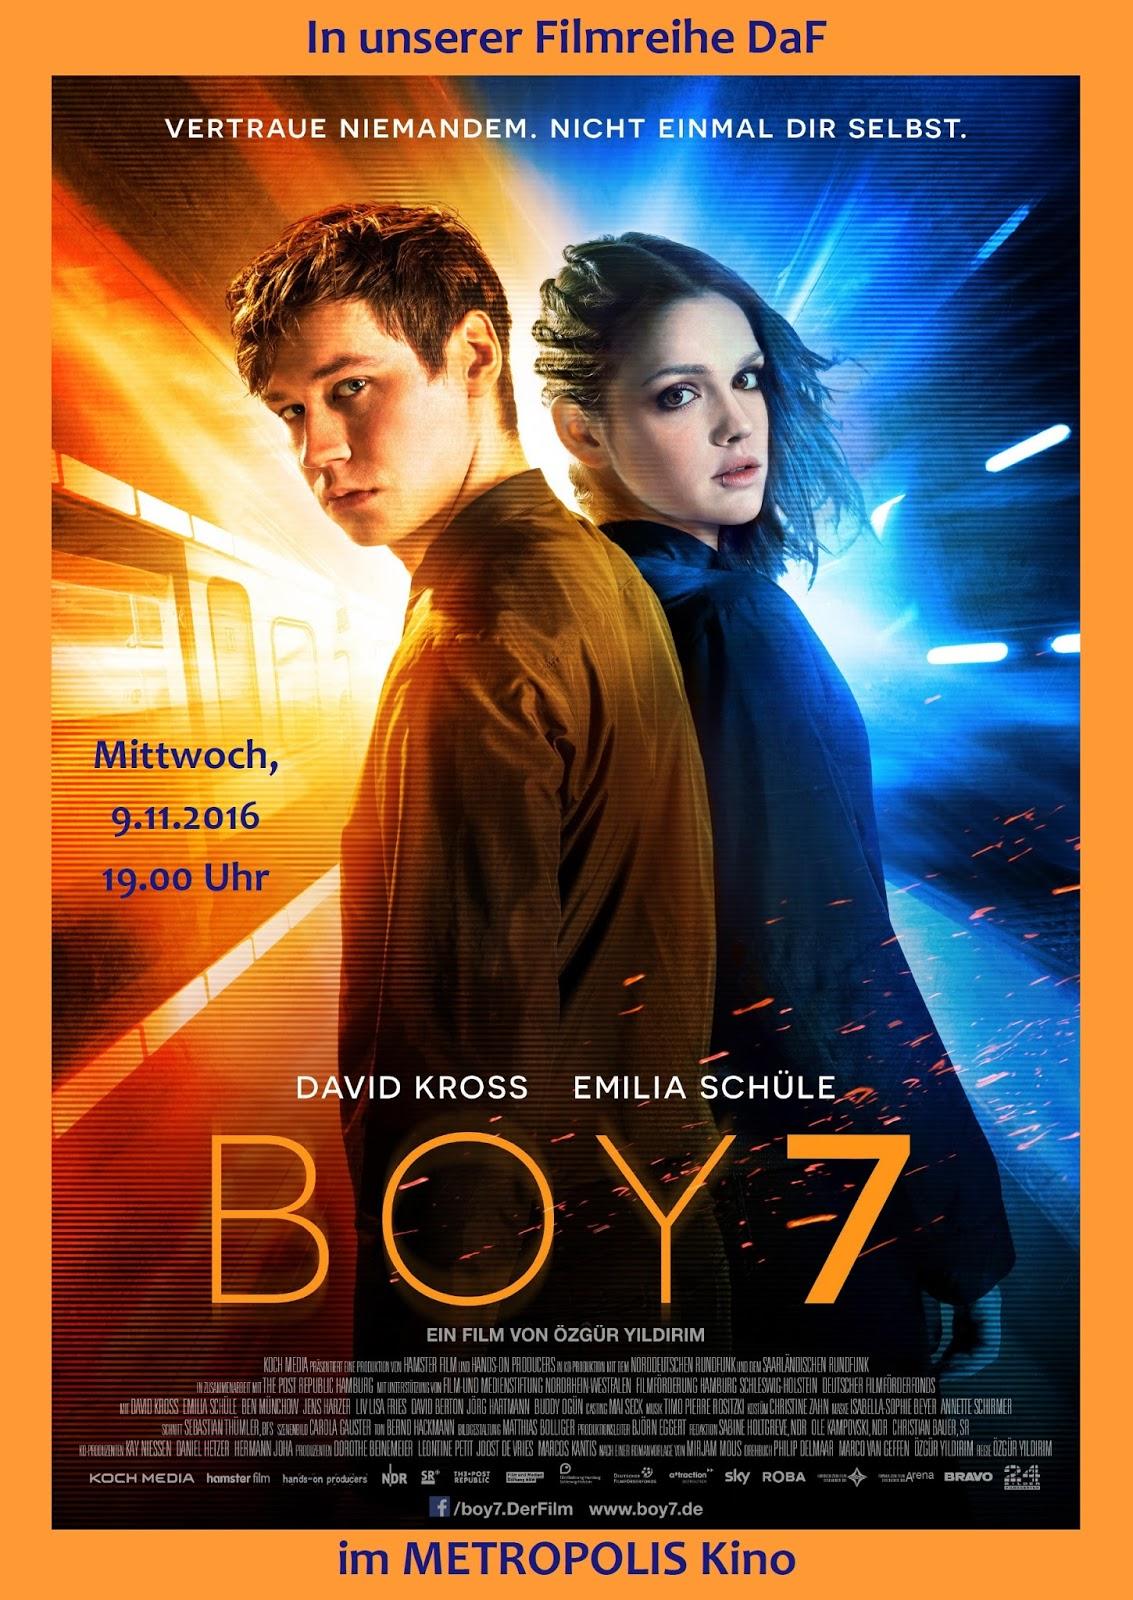 Filmteam Colón: BOY 7 am 9. November 2016 bei DaF im METROPOLIS Kino